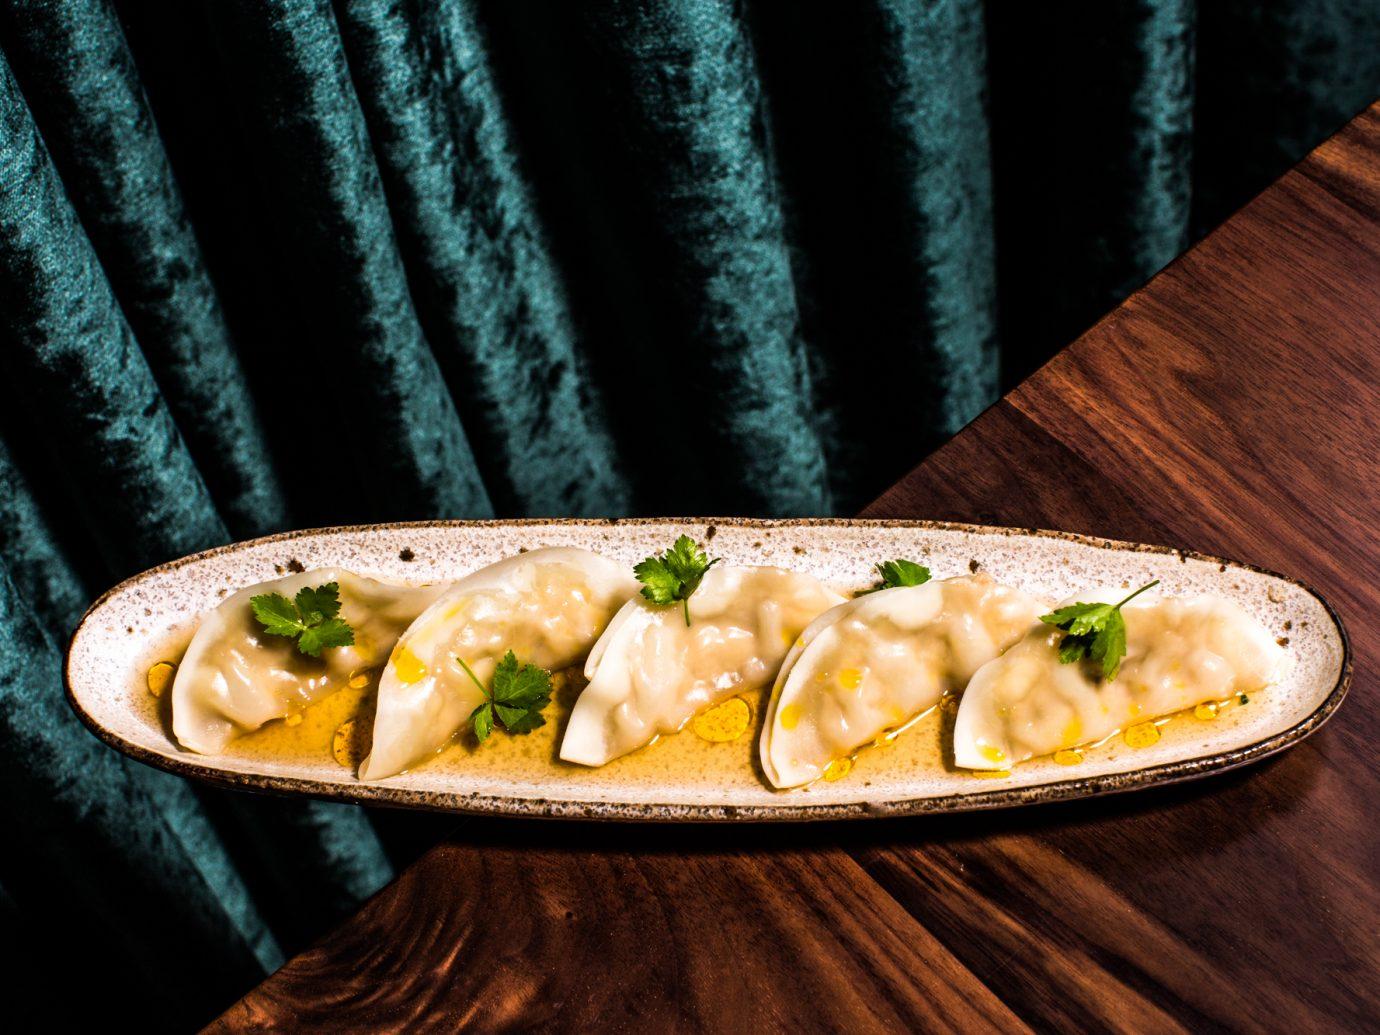 Dumpling dish at edge of table